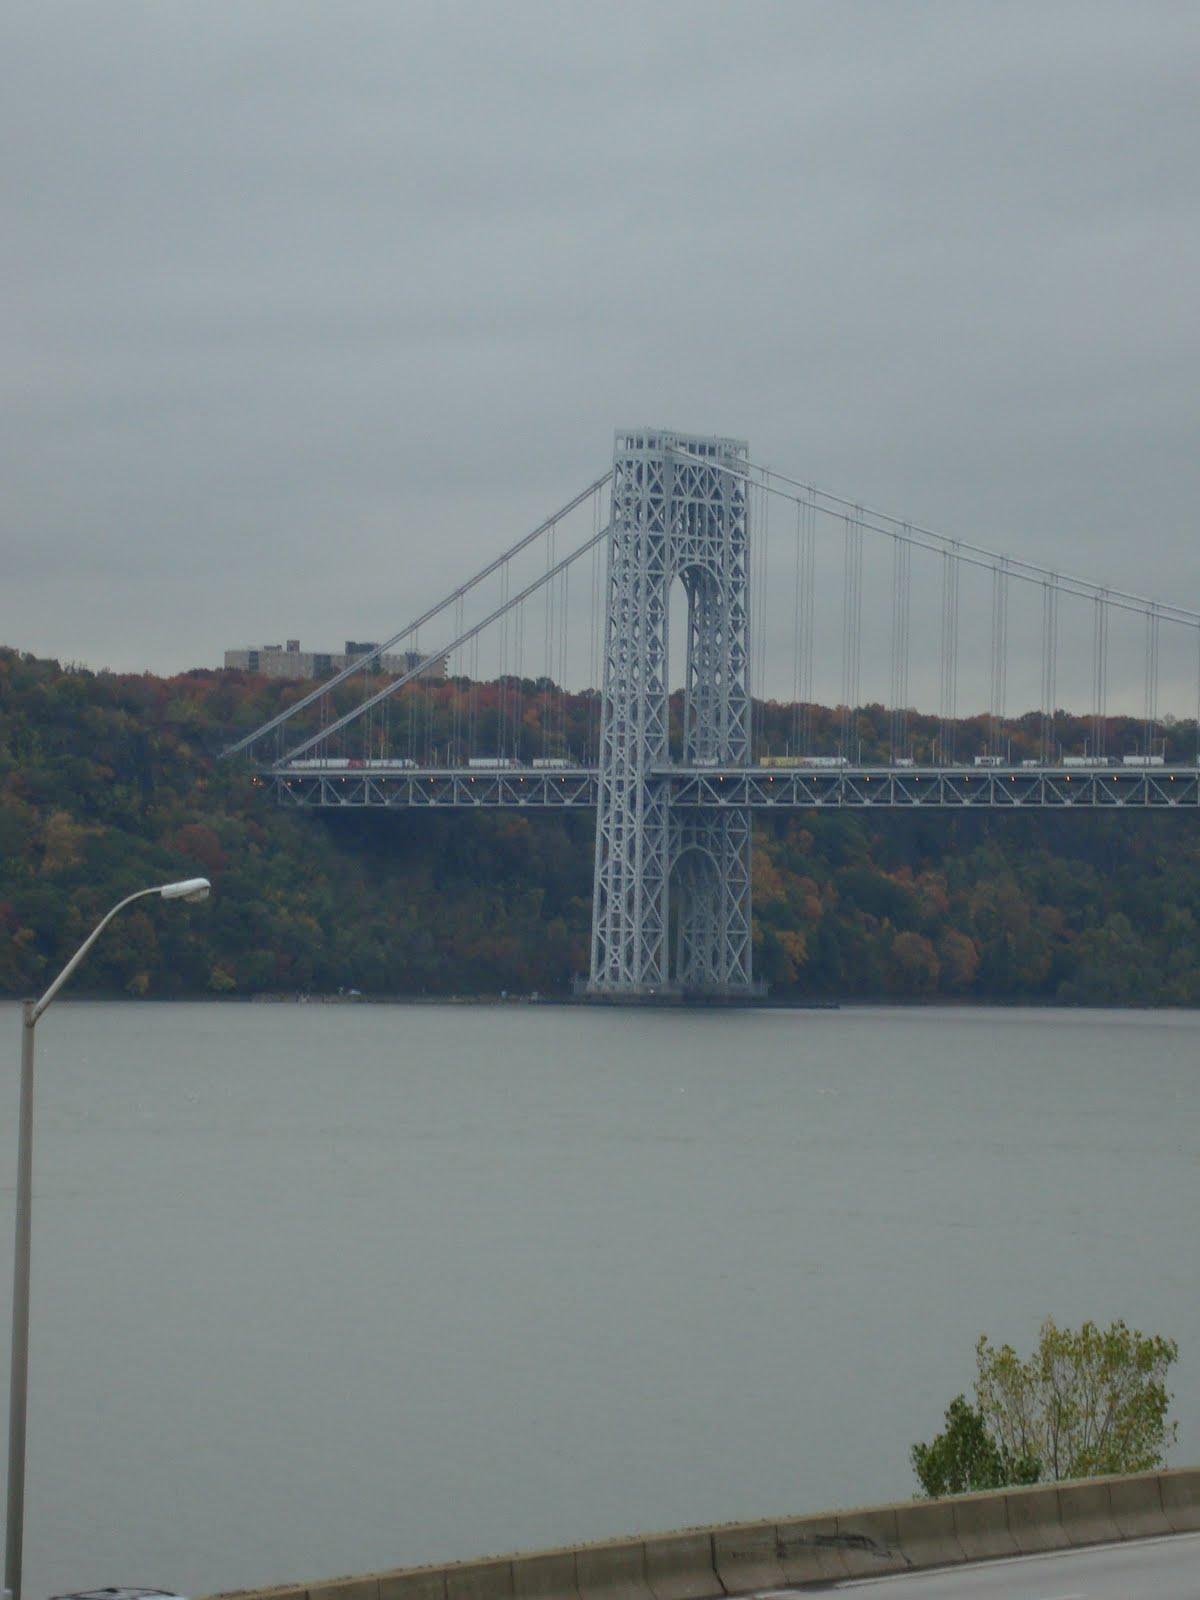 View of the George Washington Bridge - Framed Photograph